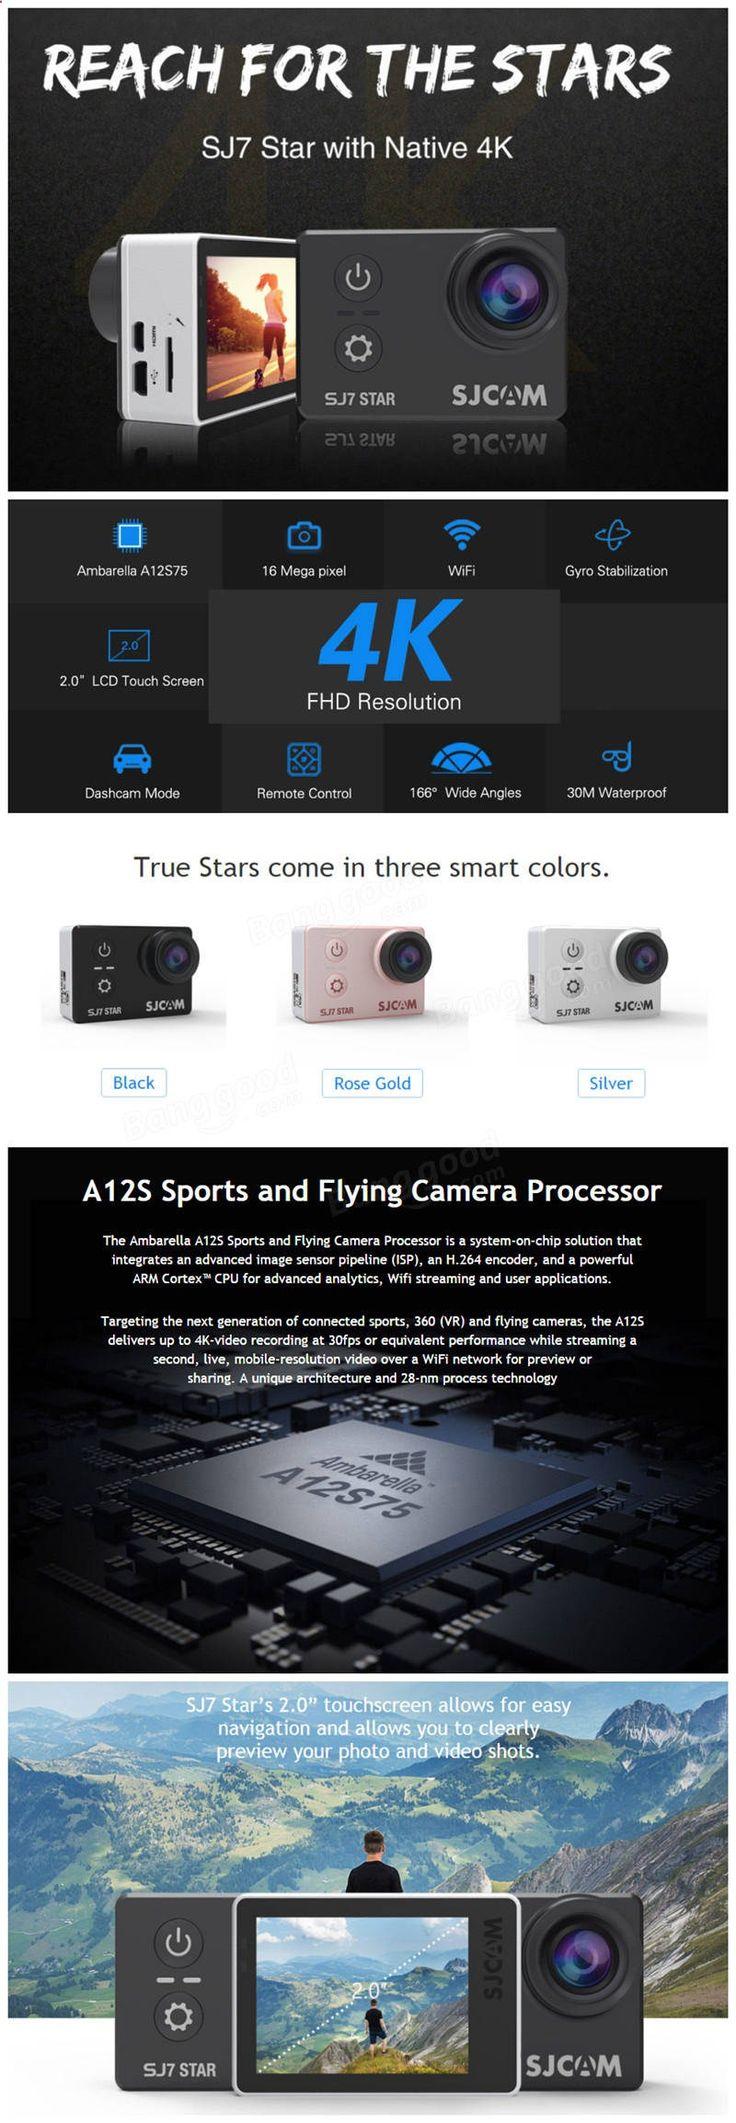 SJCAM SJ7 STAR 4K WIFI Action Camera IMX117 CMOS 2.0 Inch LCD Sport DV Ambarella A12S75